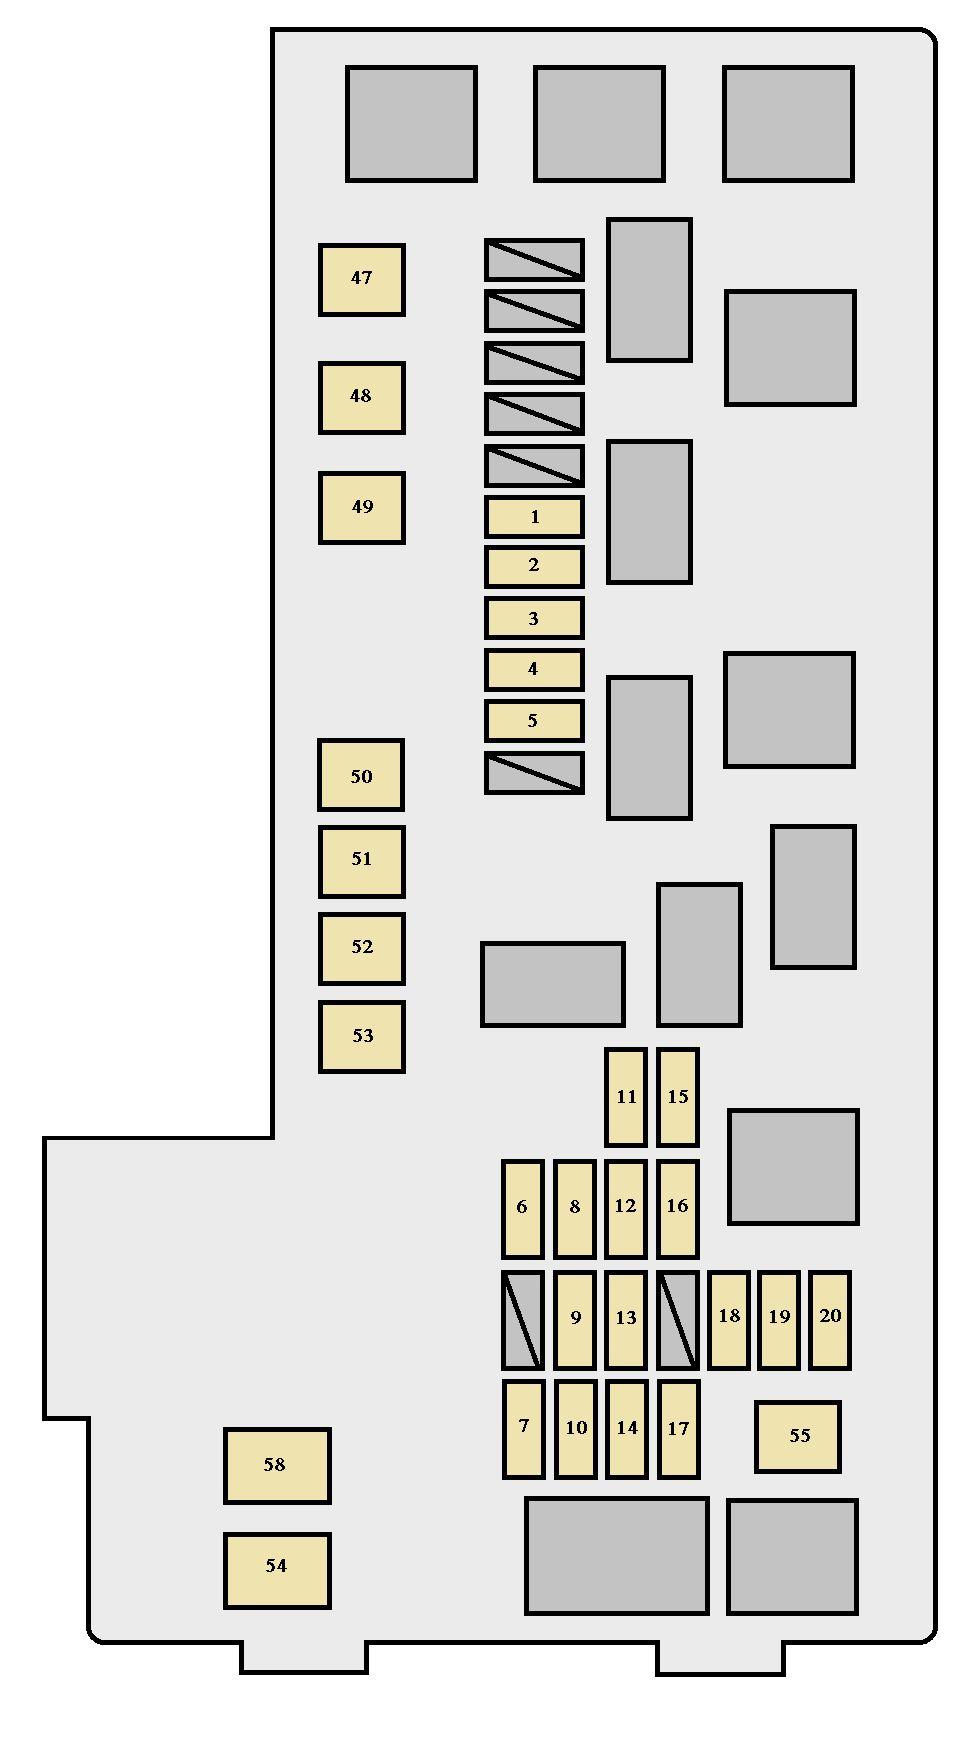 toyota hiace wiring diagram 1998 ford expedition stereo 2002 highlander fuse all data xu20 2000 2003 box auto genius pontiac grand prix